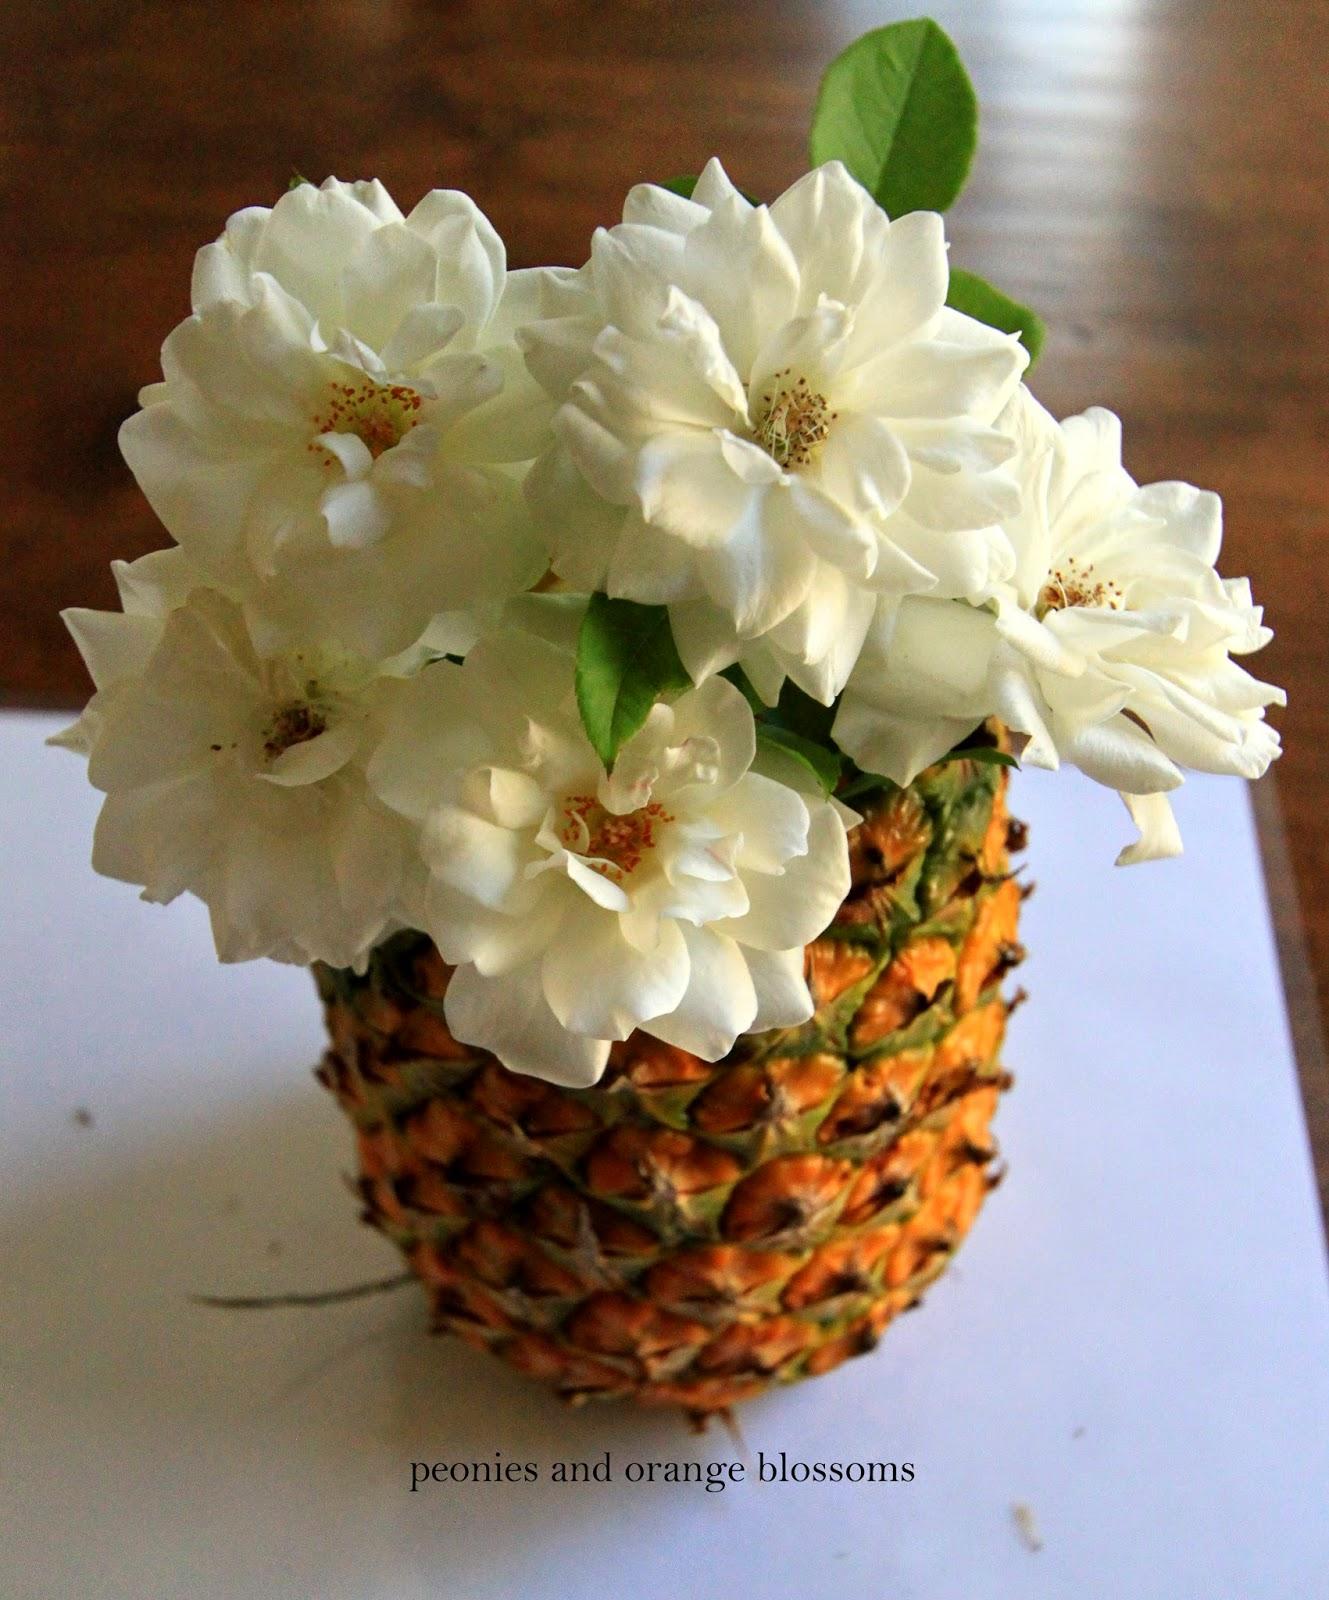 easy diy pineapple vase petite haus. Black Bedroom Furniture Sets. Home Design Ideas